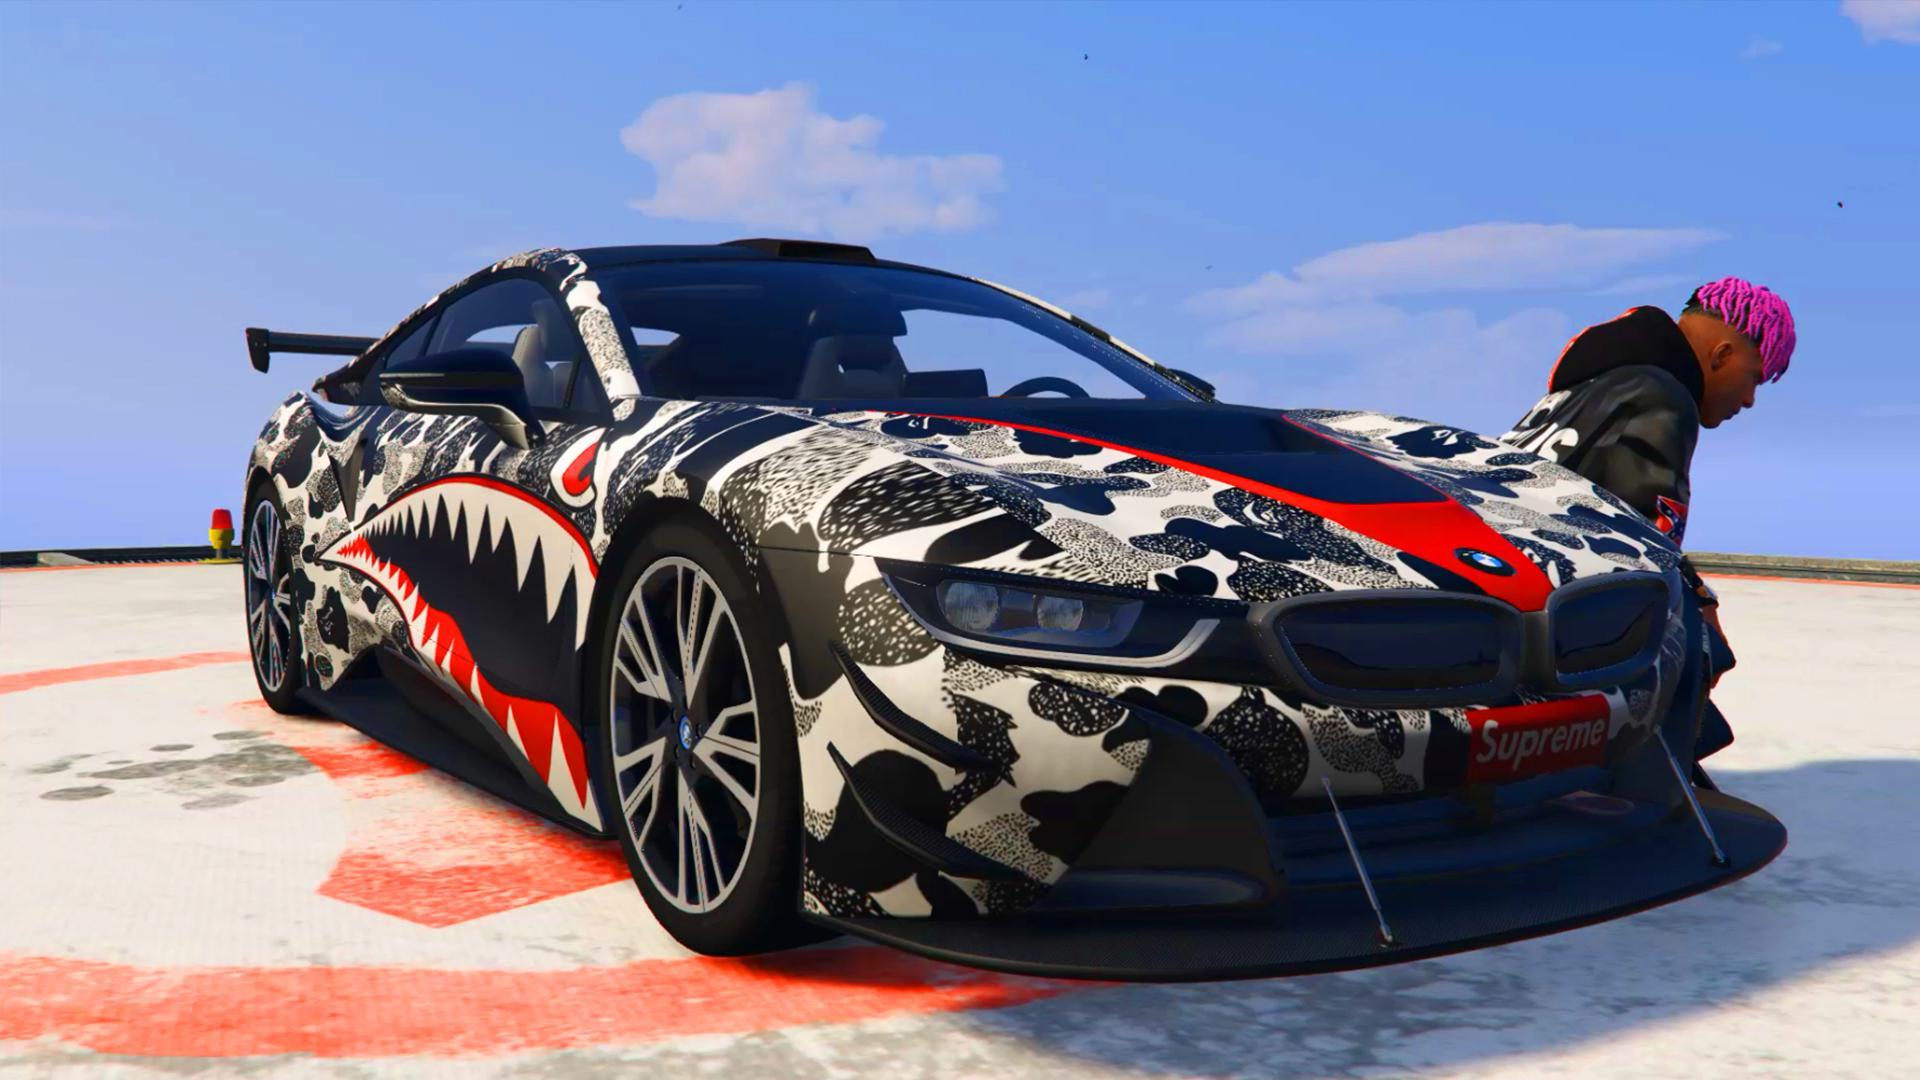 Bmw I8 Supreme Bape Shark Texture Hq Gta5 Mods Com